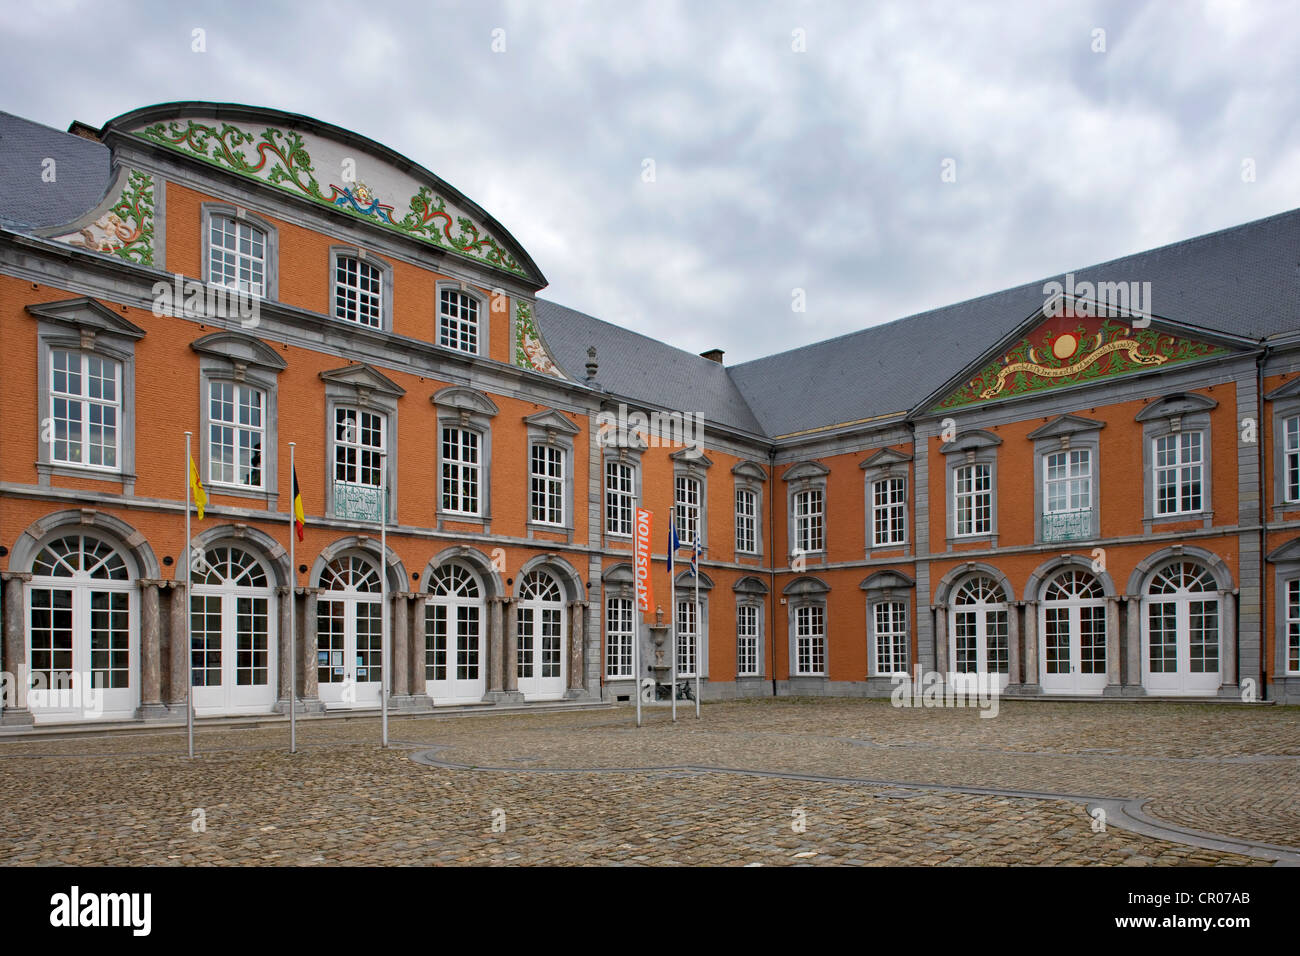 Quartier Abbatial / Abbot Palace at the abbey of Saint Hubert at Saint-Hubert, Ardennes, Belgium - Stock Image